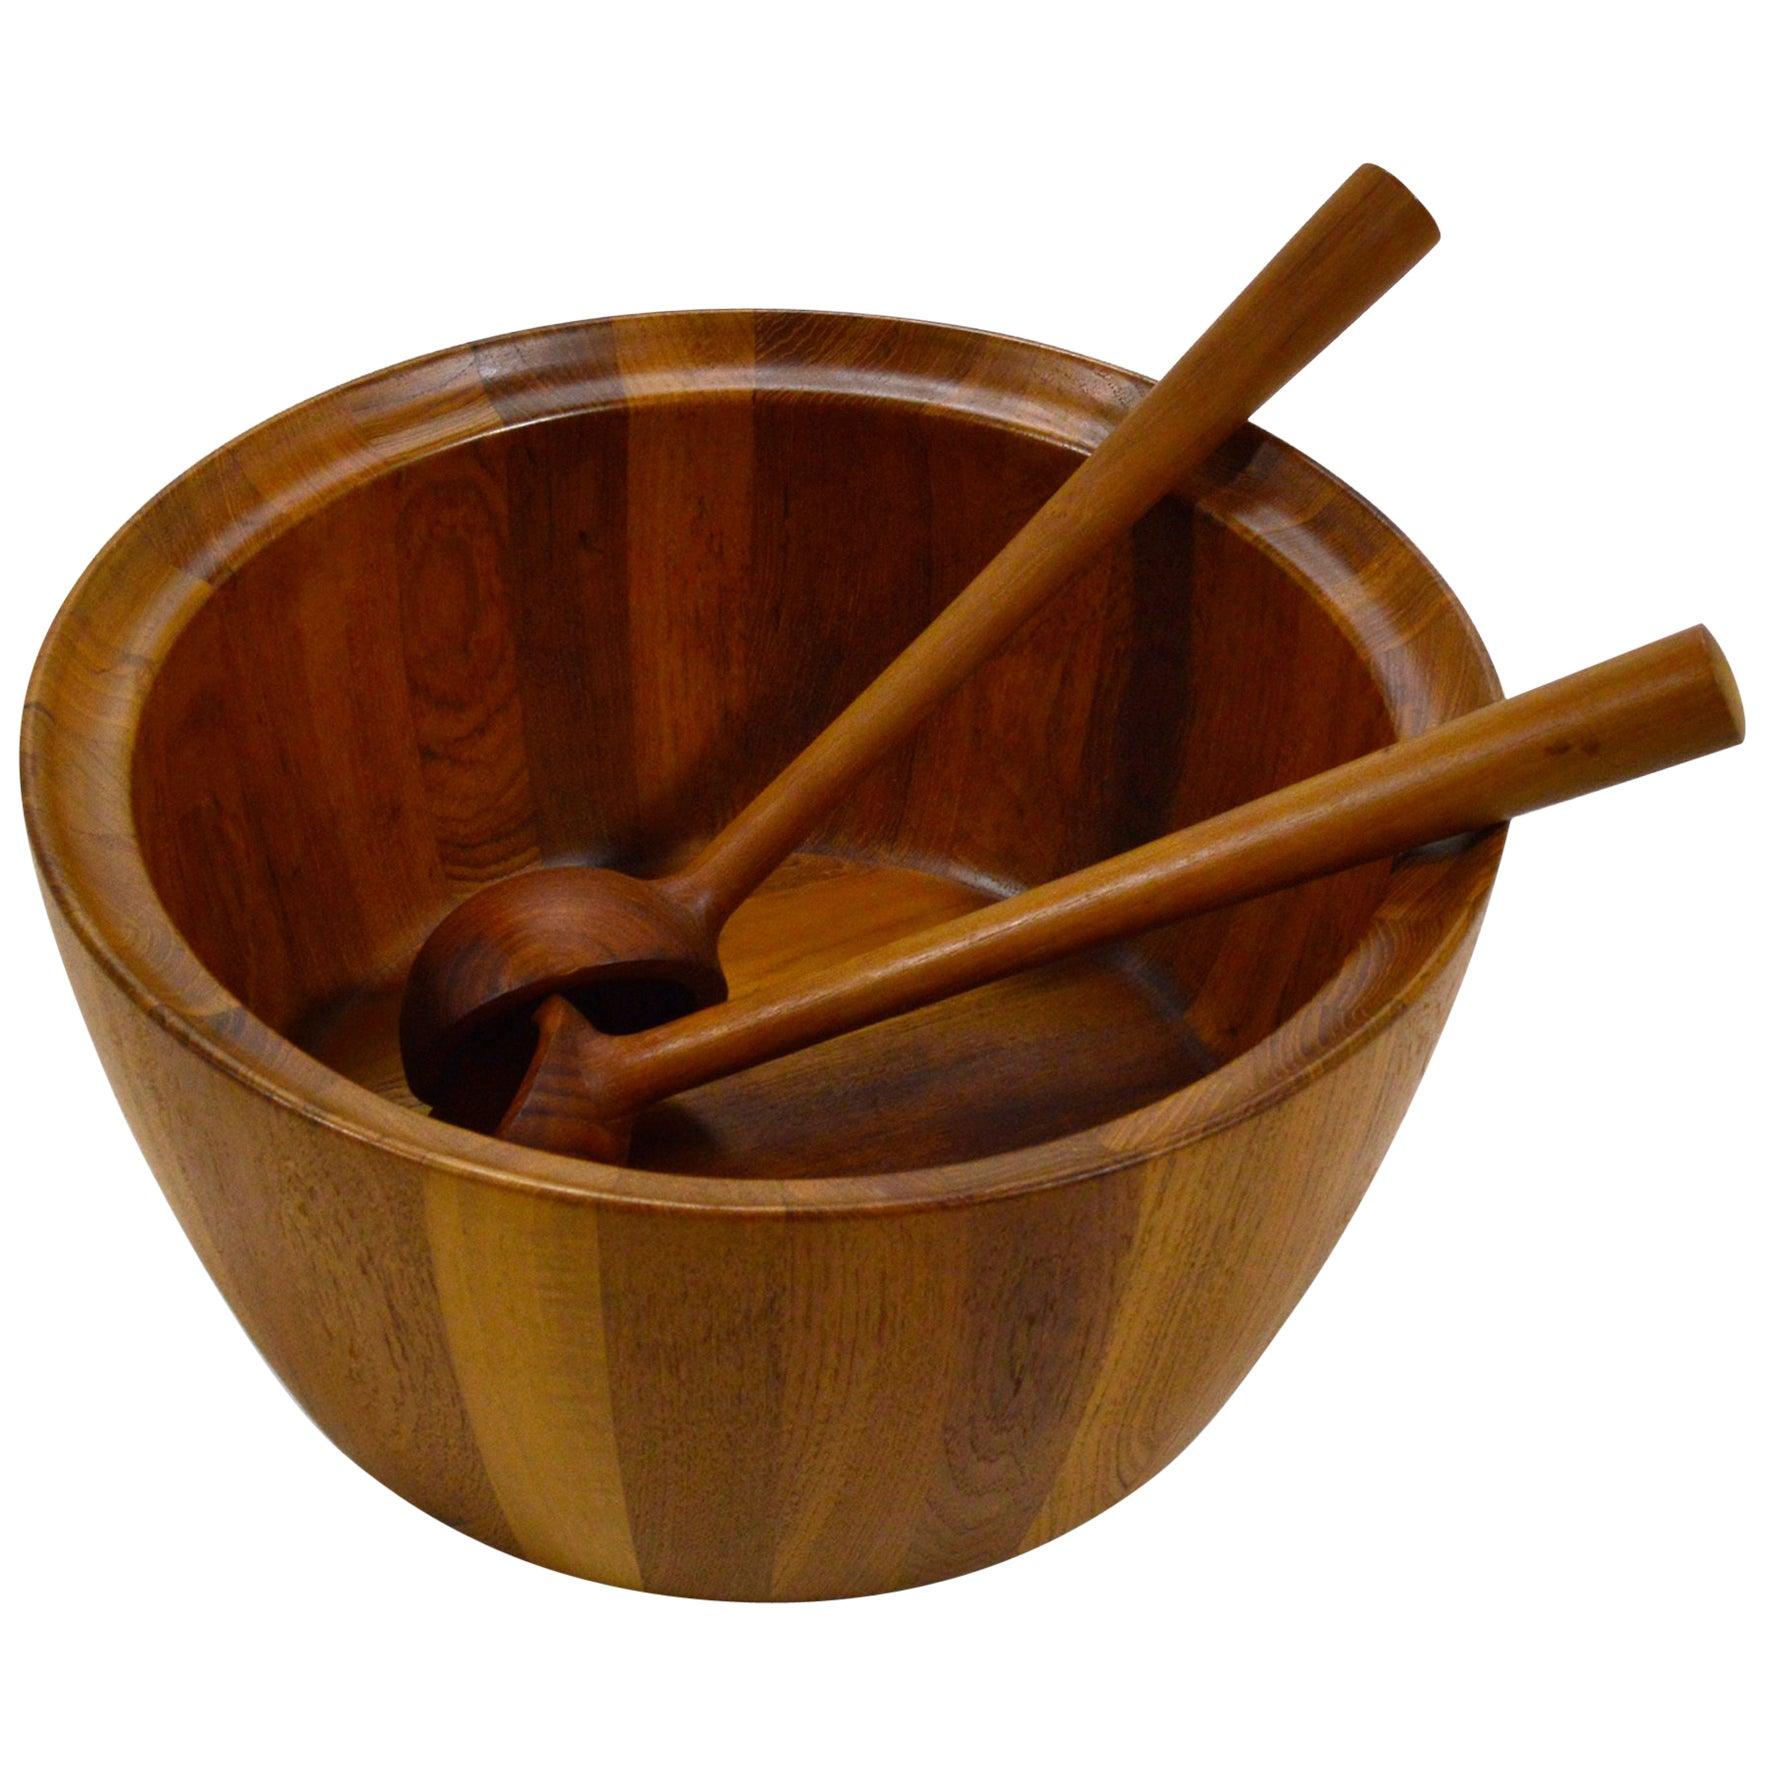 Oversize Staved Teak Bowl and Servers by Richard Nissen